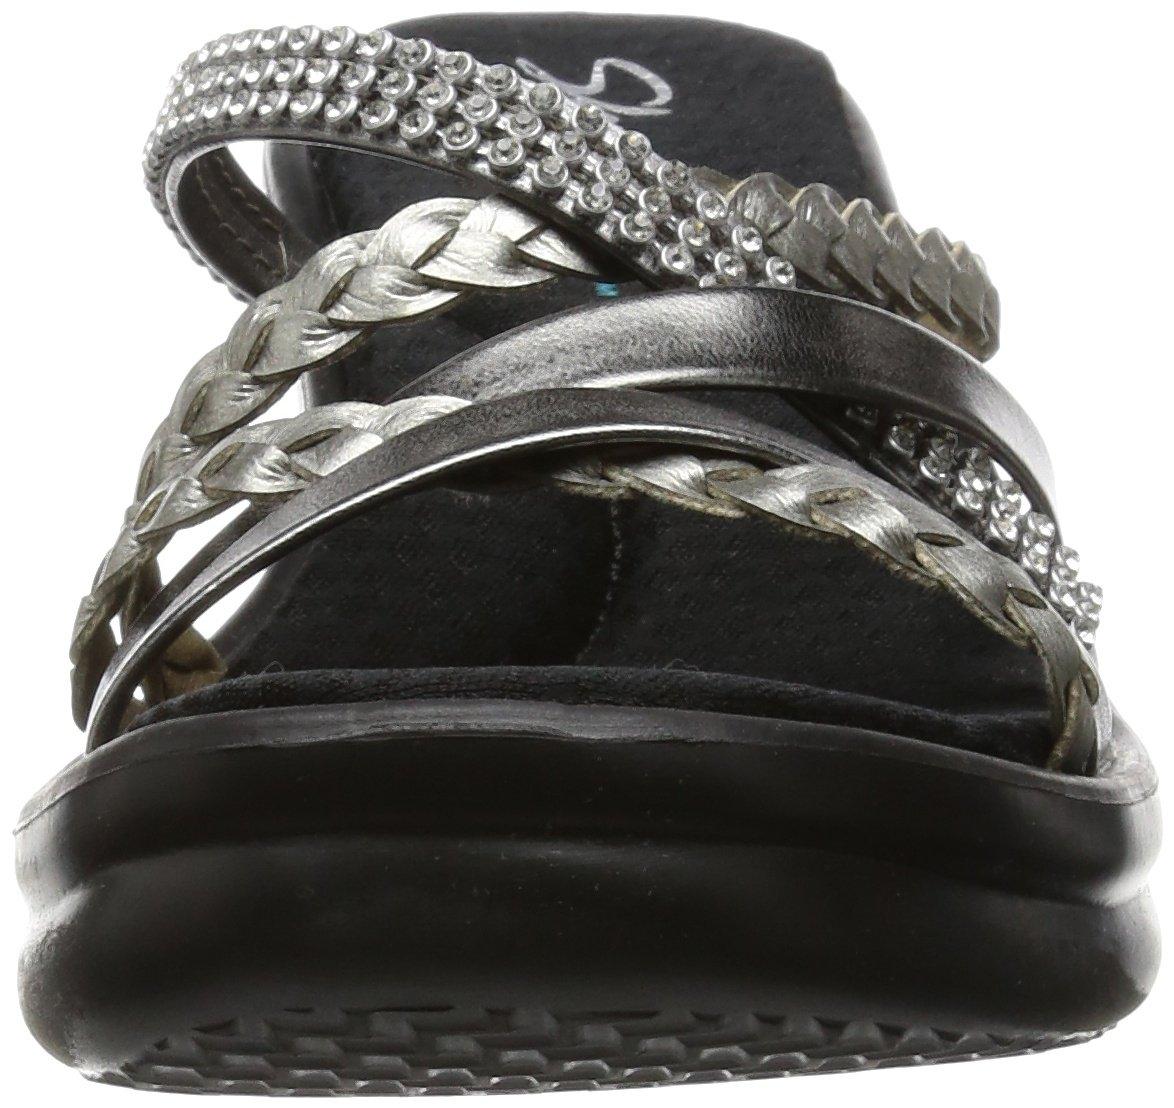 5daa8cbd37bb Skechers Cali Women s Rumbers-Wild Child Wedge Sandal